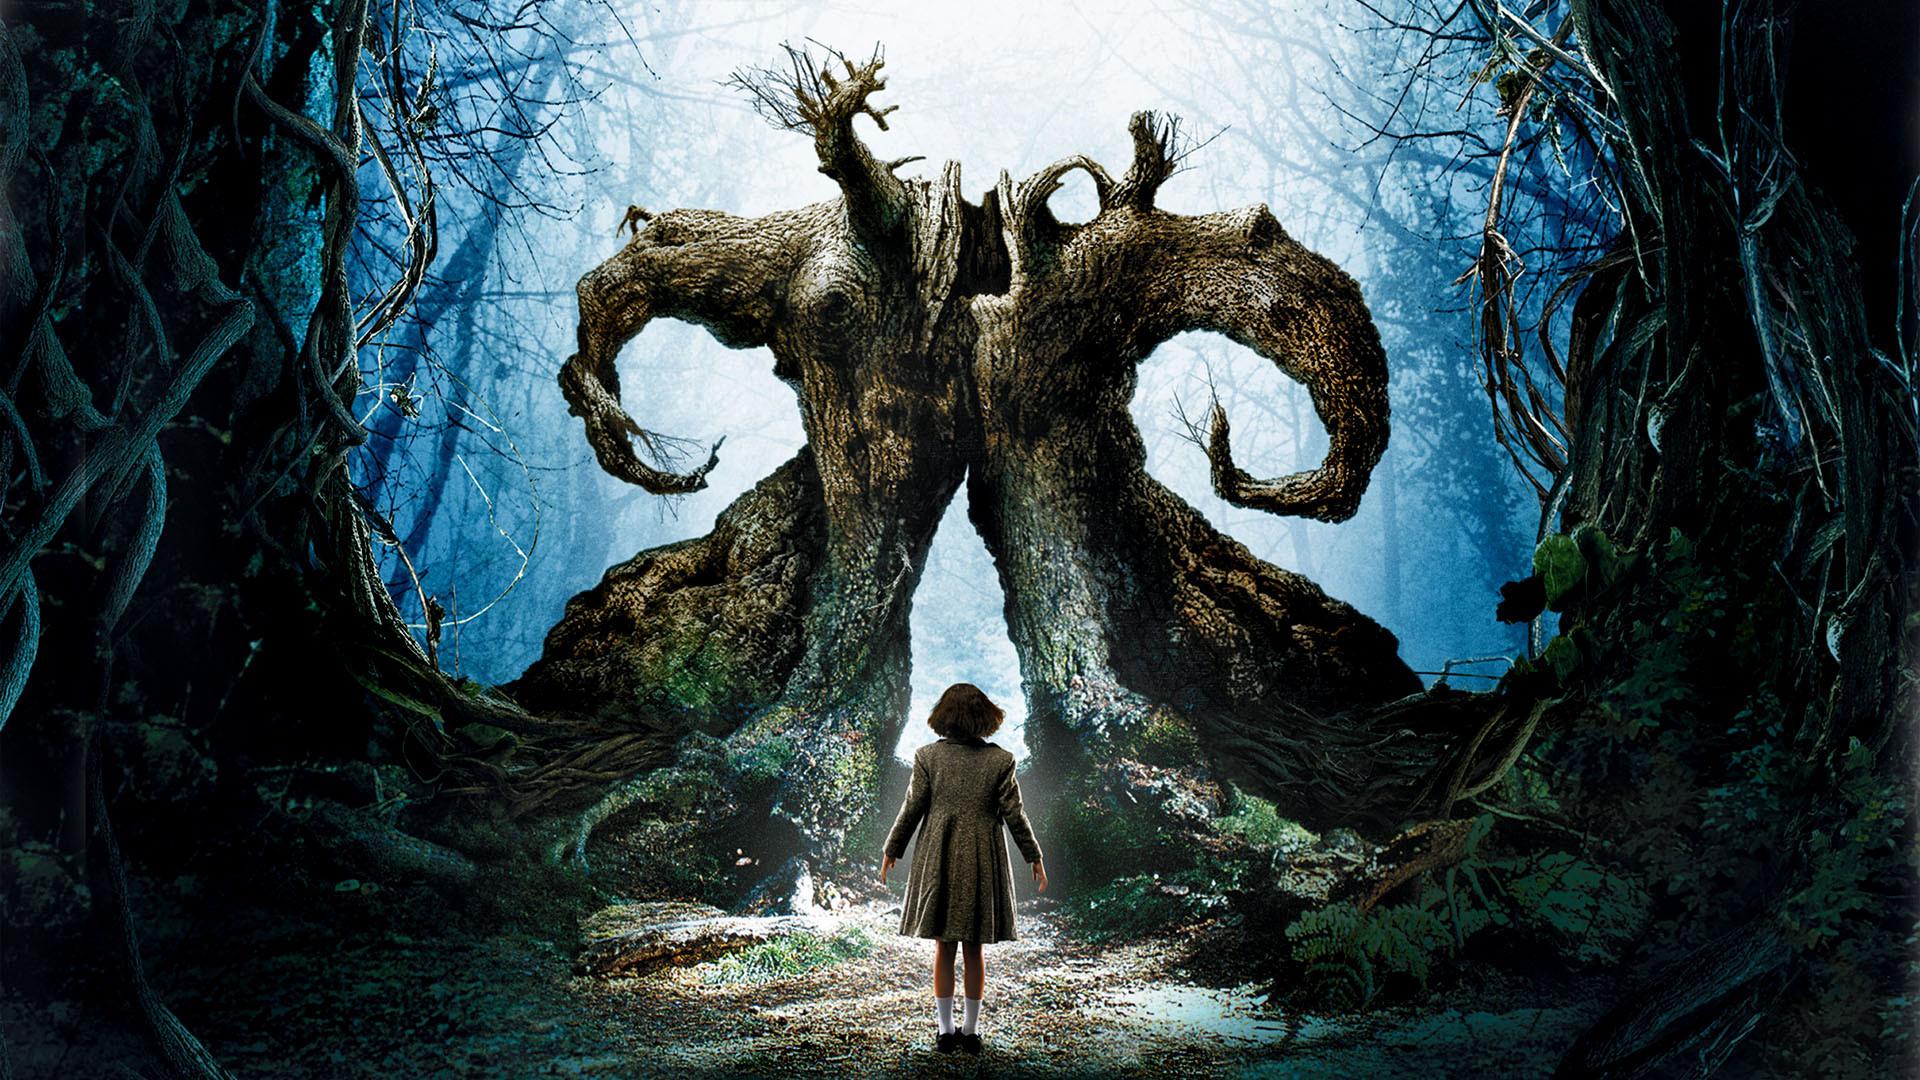 Pan's Labyrinth 4K Review